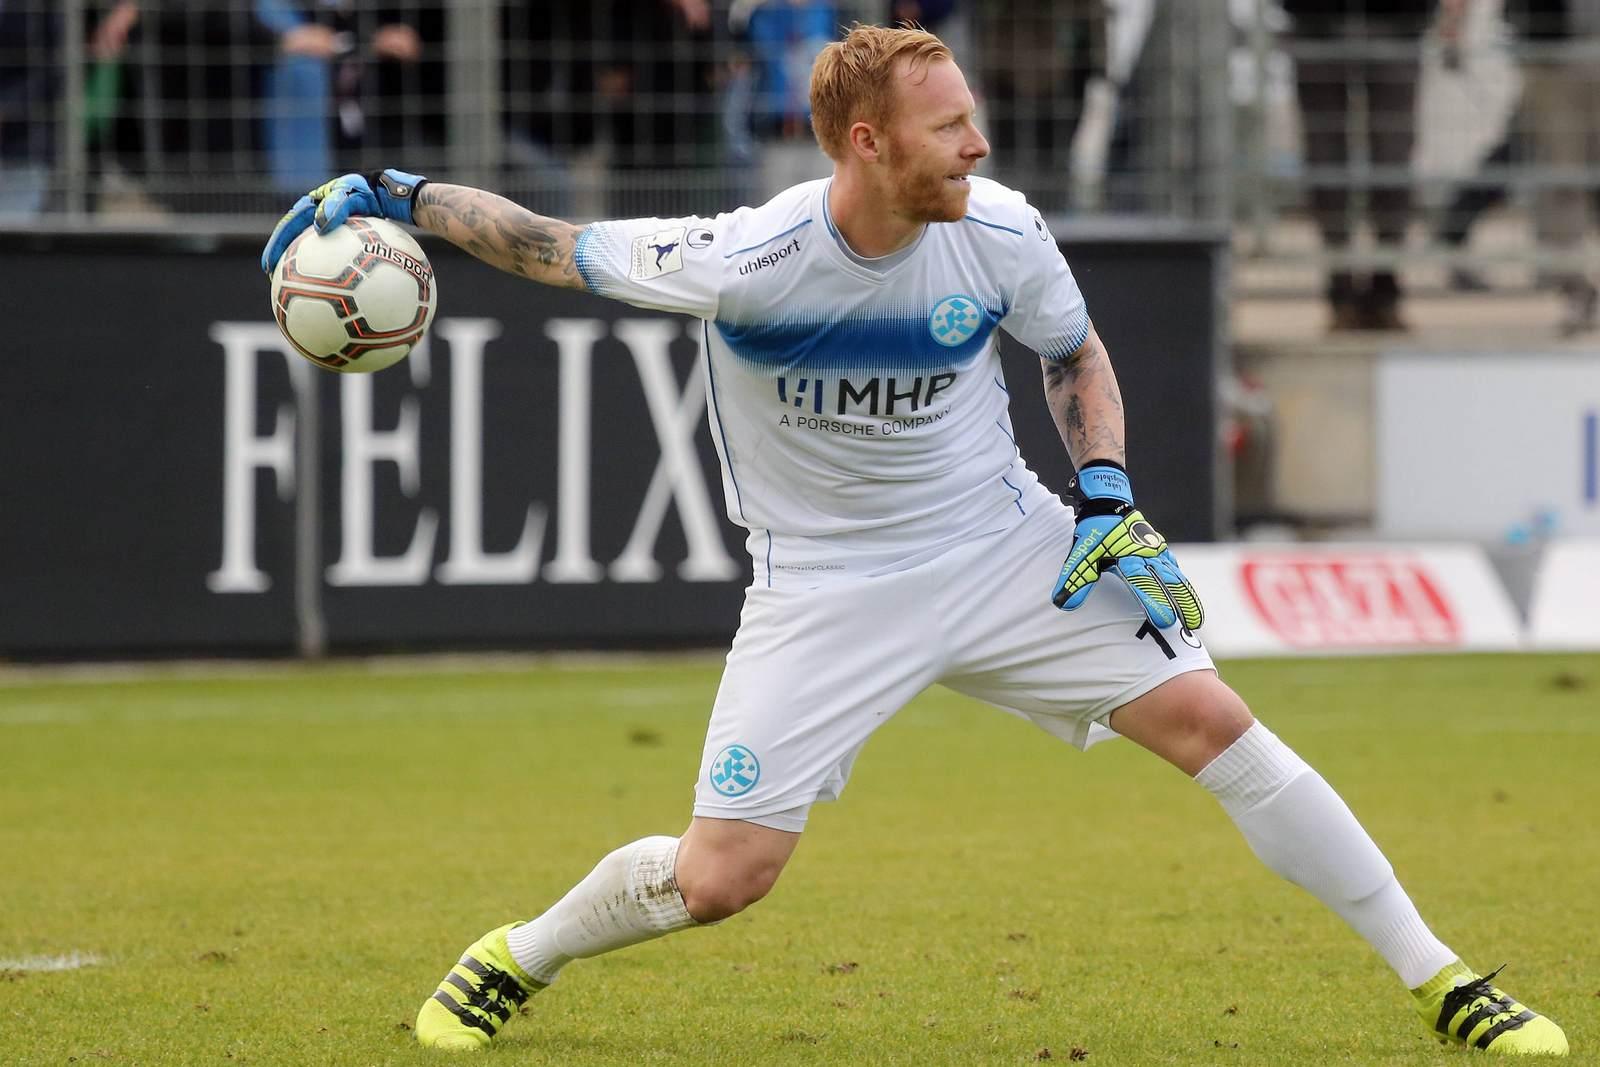 Lukas Königshofer, hier noch im Trikot der Stuttgarter Kickers